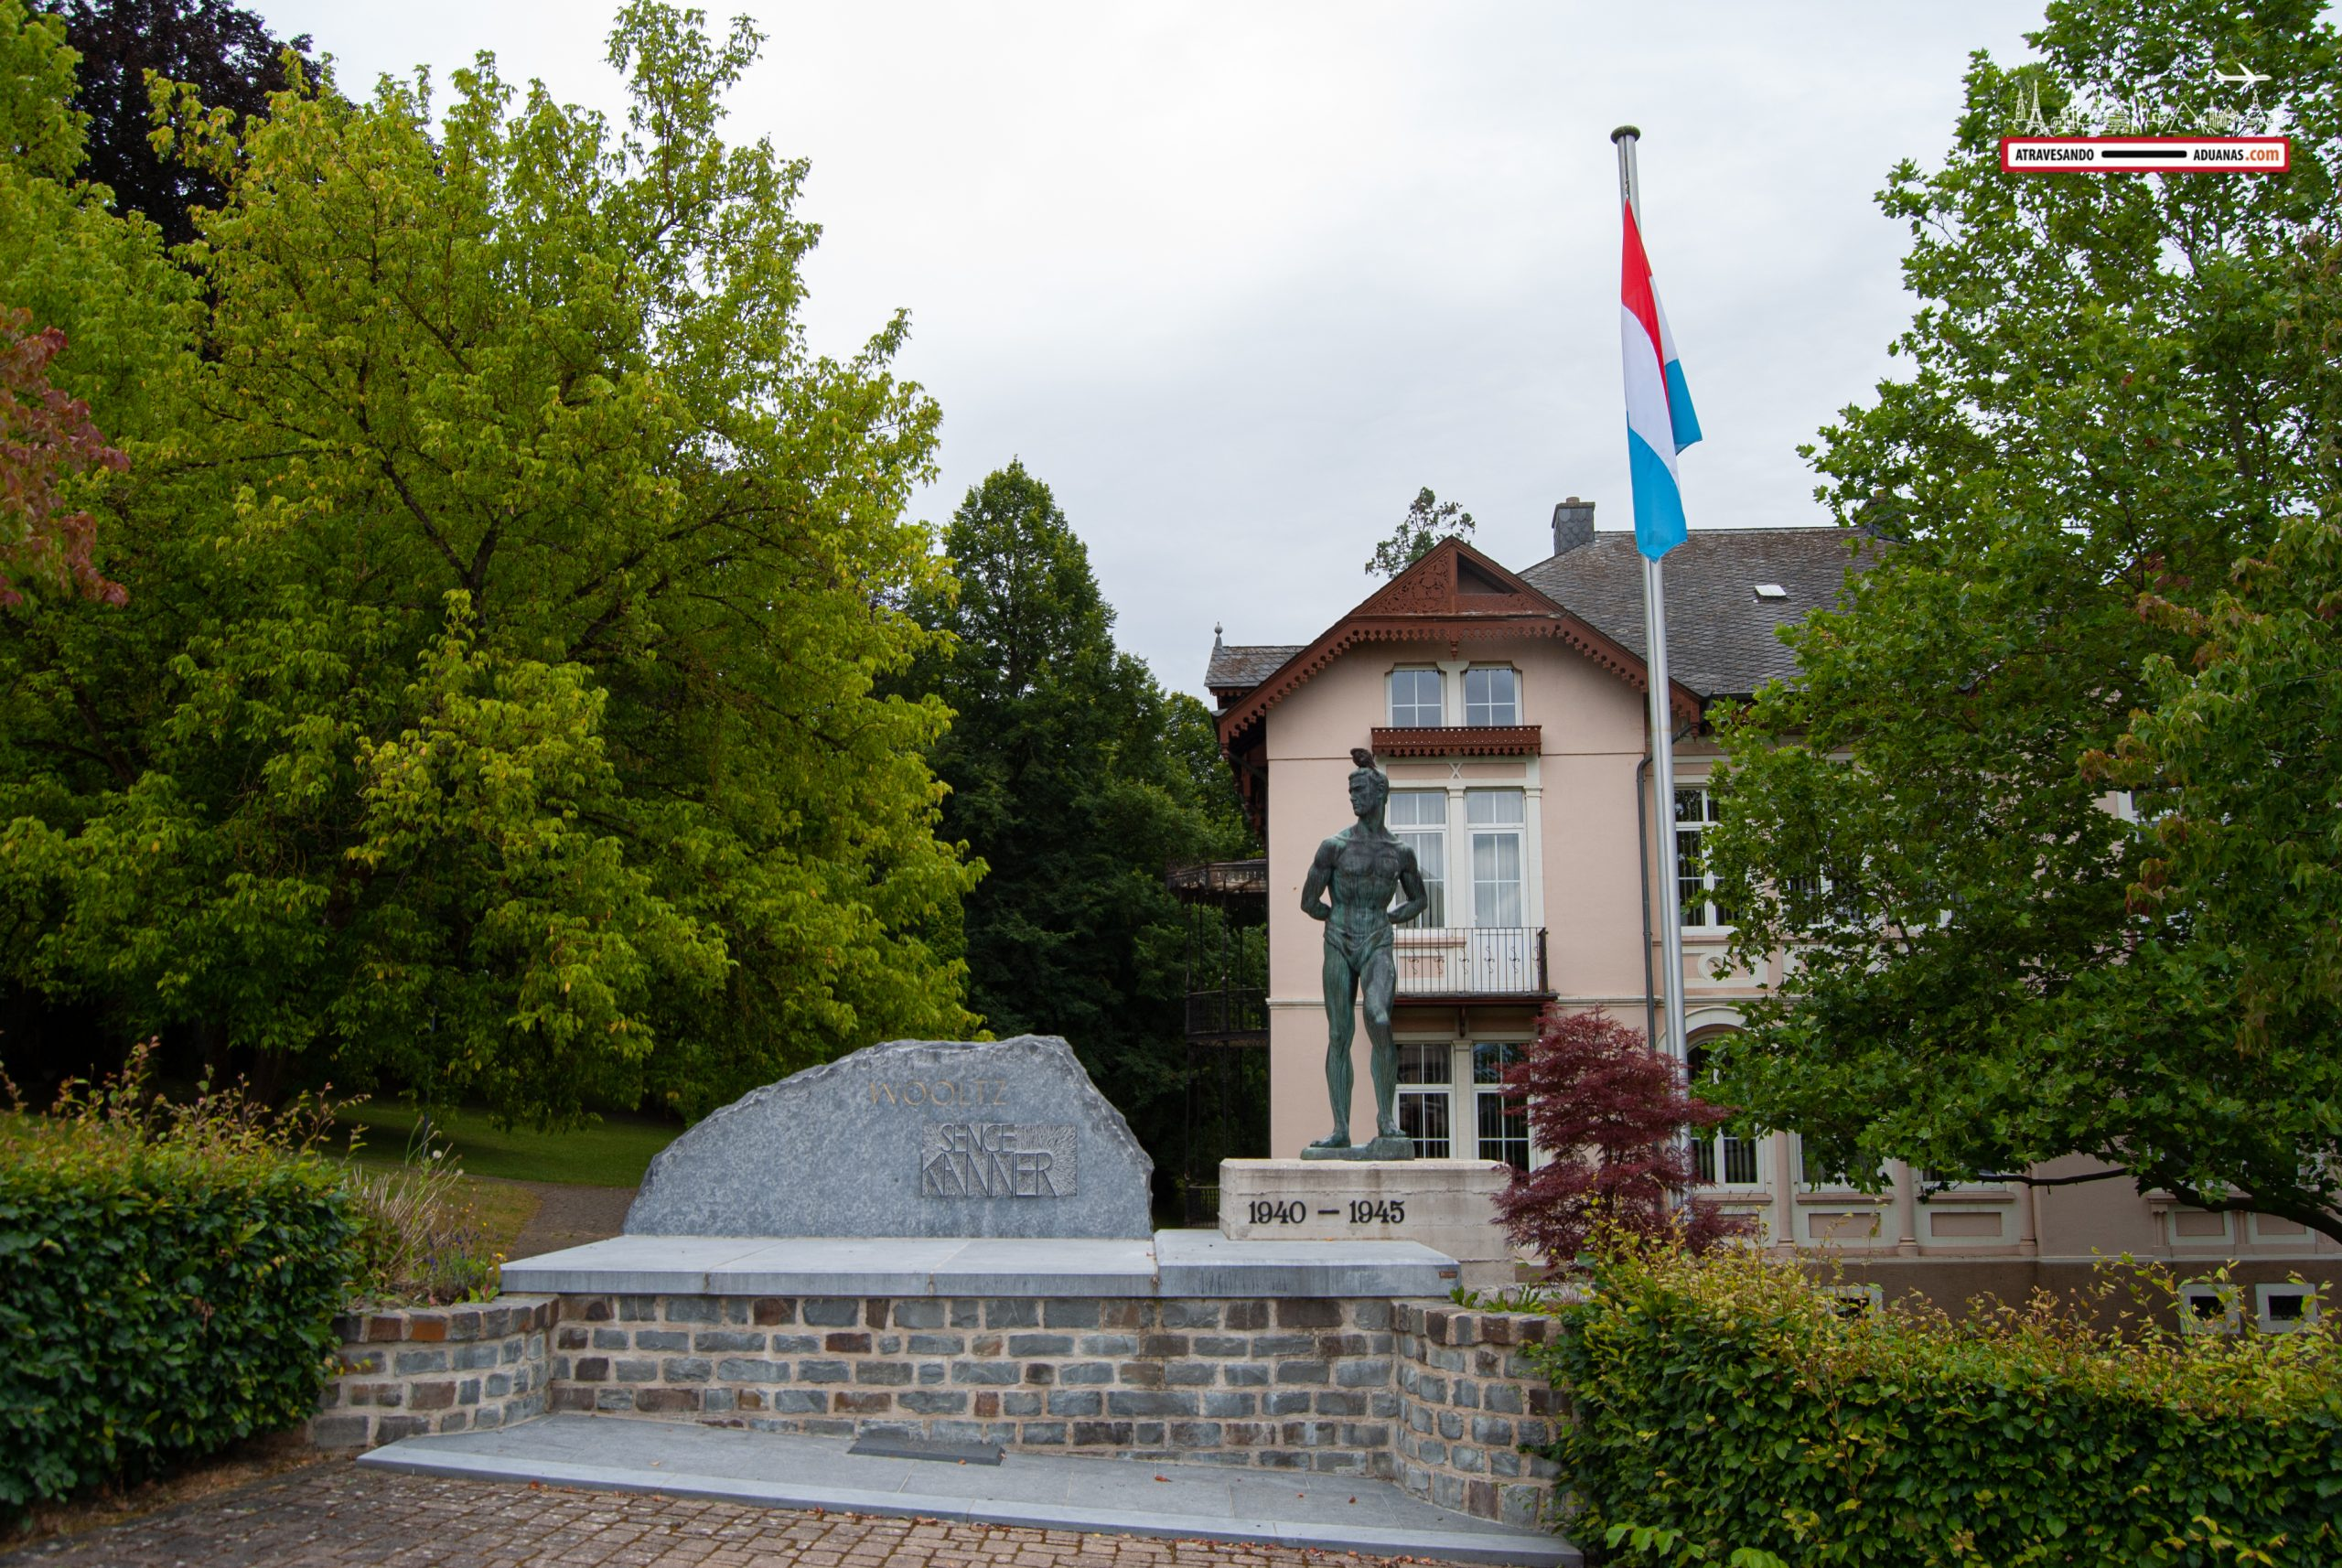 Memorial de la Segunda Guerra Mundial en Wiltz, Luxemburgo